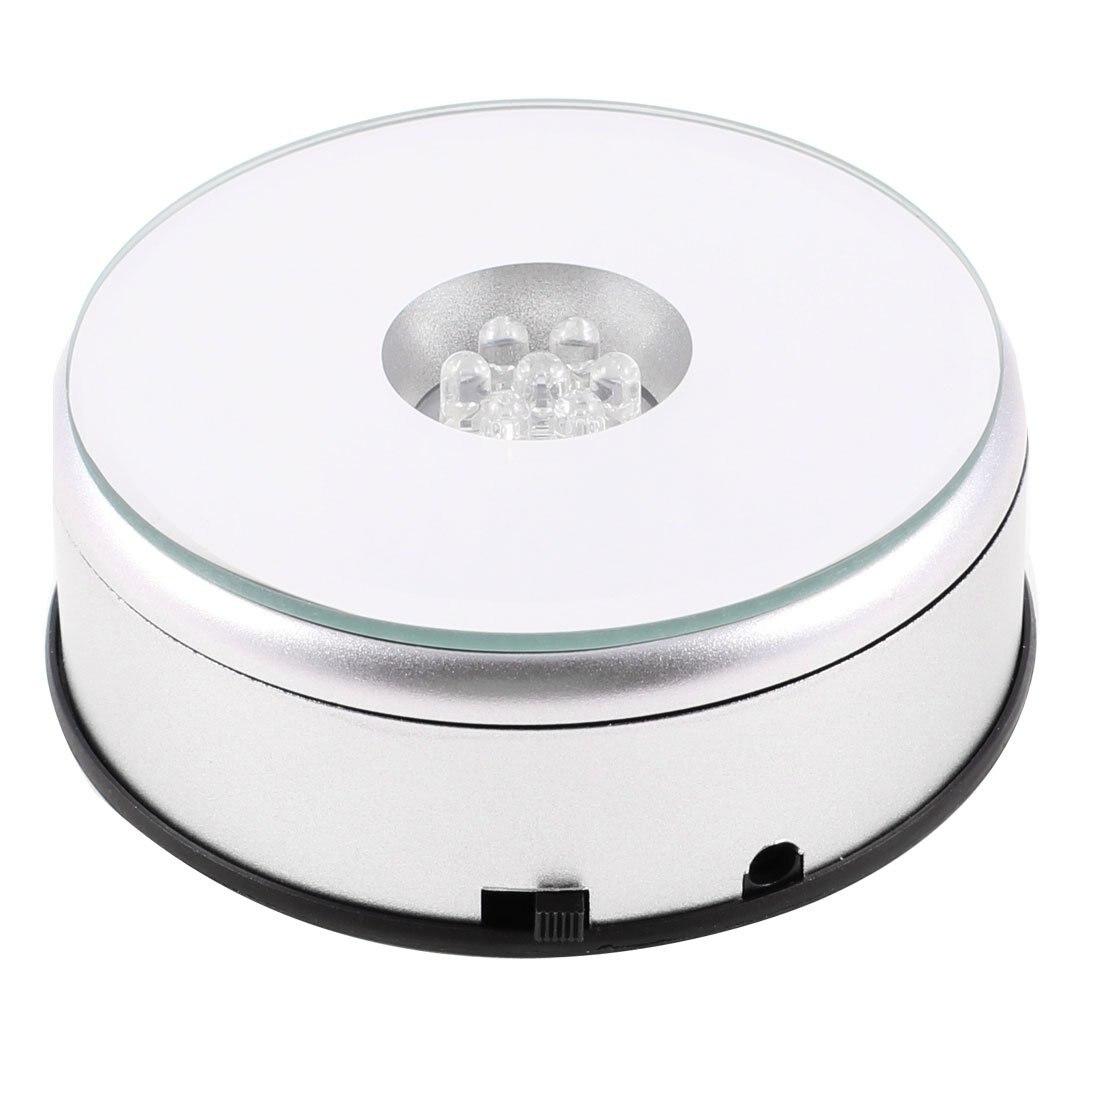 7 LED Light Stand Turntable Rotating Base for Display Crystals Glass metal circular rotating base camera photography turntable for standard servo f17314